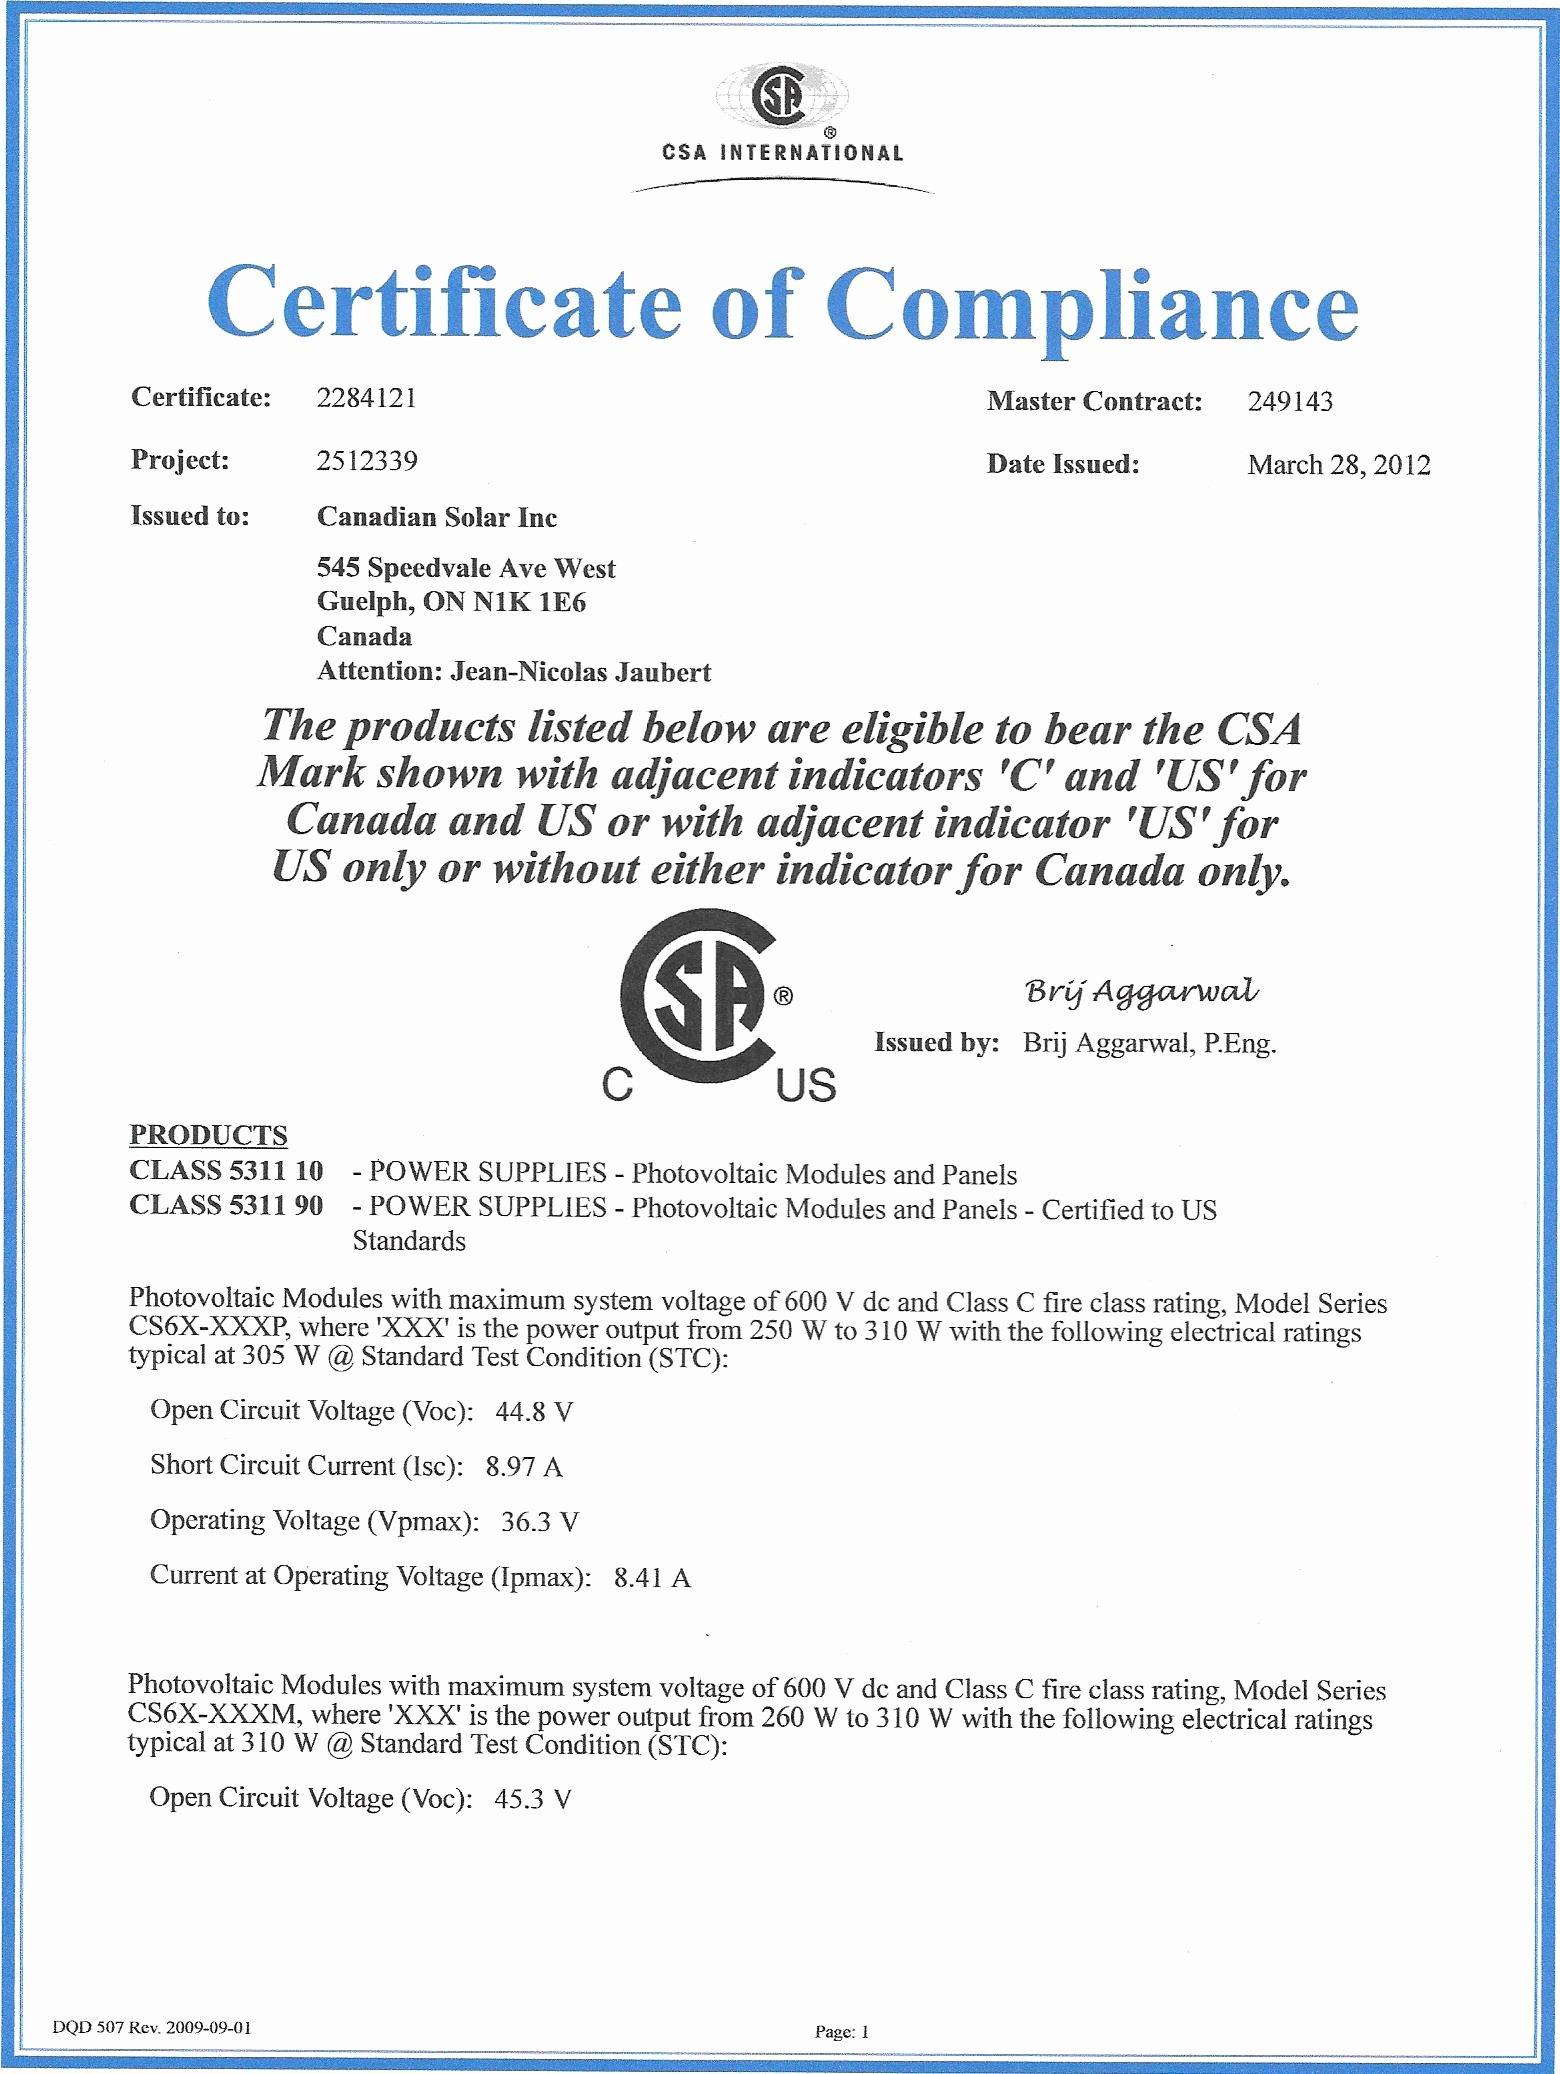 Certificate Of Compliance Template Beautiful Flint Hills Renewable Energy & Efficiency Cooperative Inc